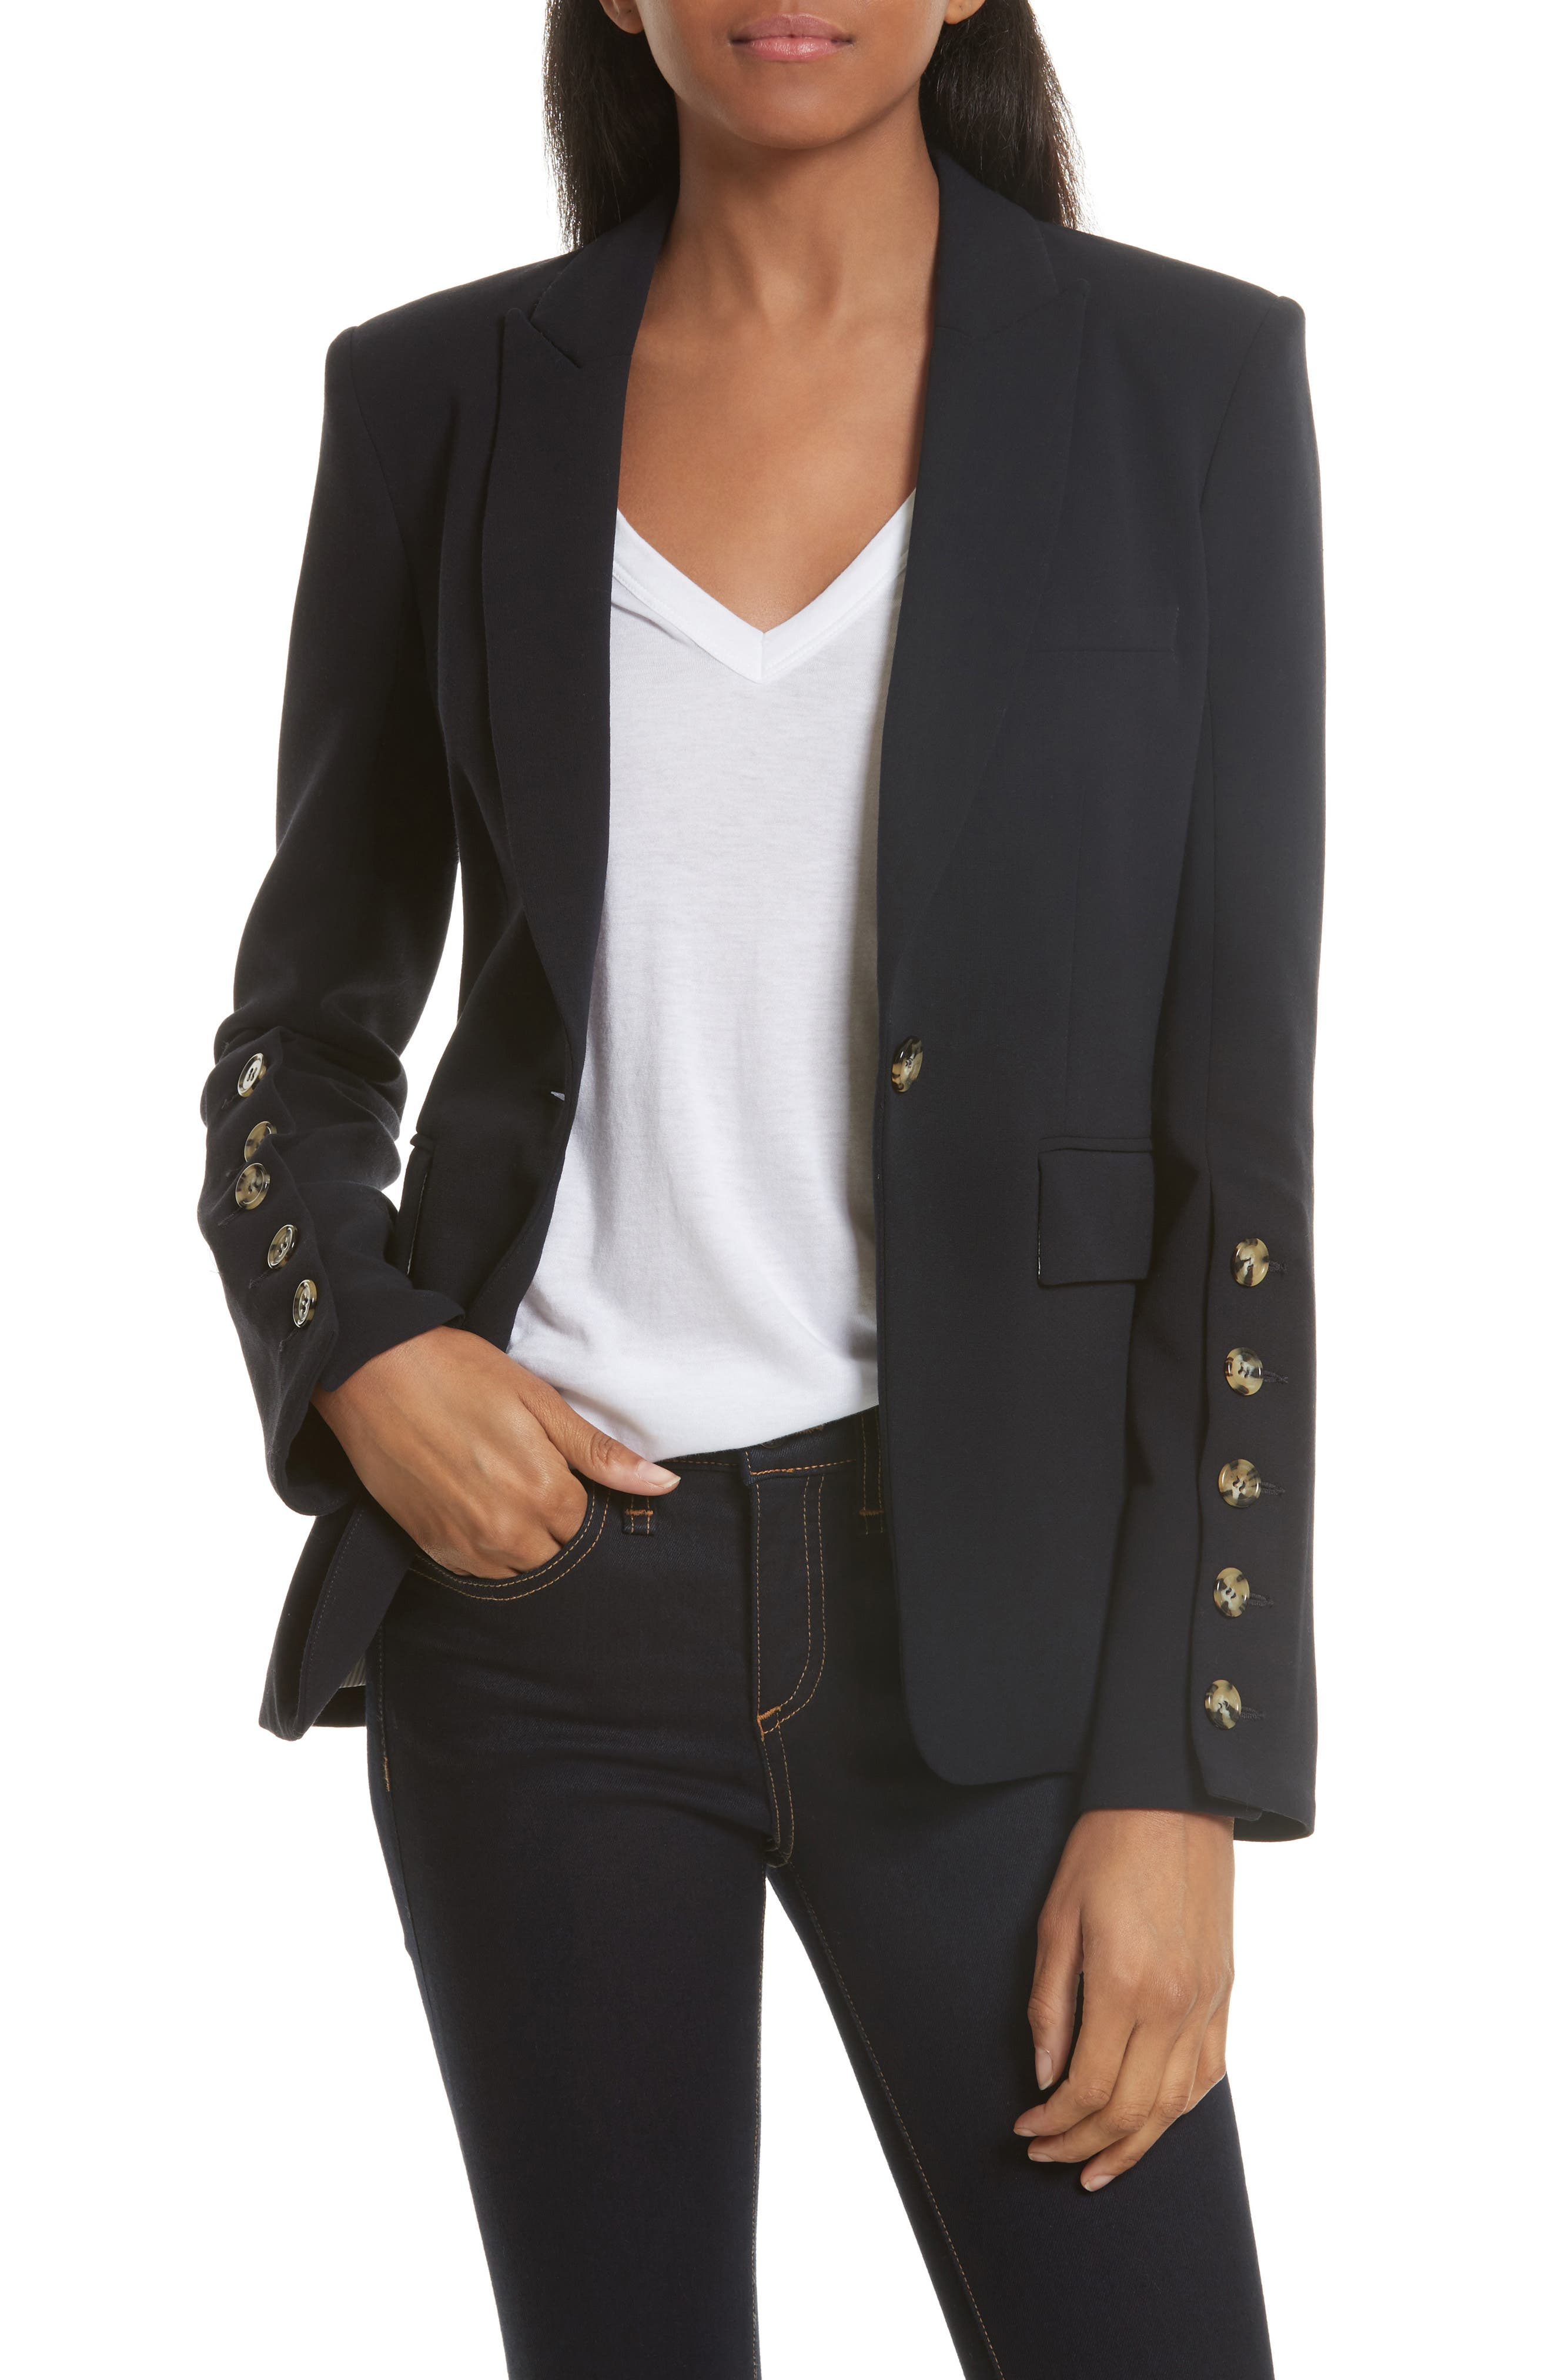 Main Image - Veronica Beard Steele Cutaway Jacket